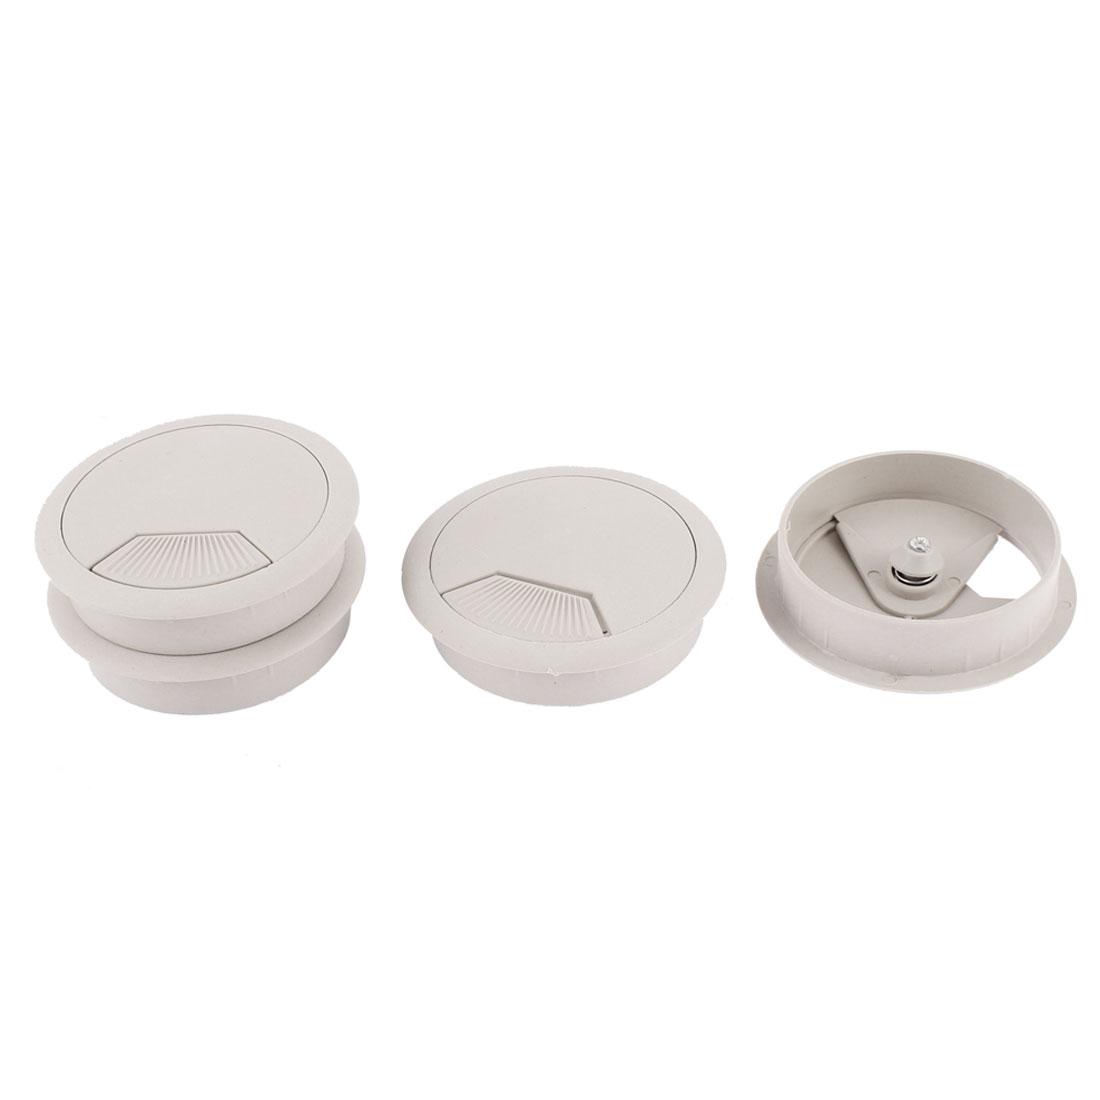 Plastic 60mm Round Computer Desk Wire Cable Hole Cover Grommets 4Pcs